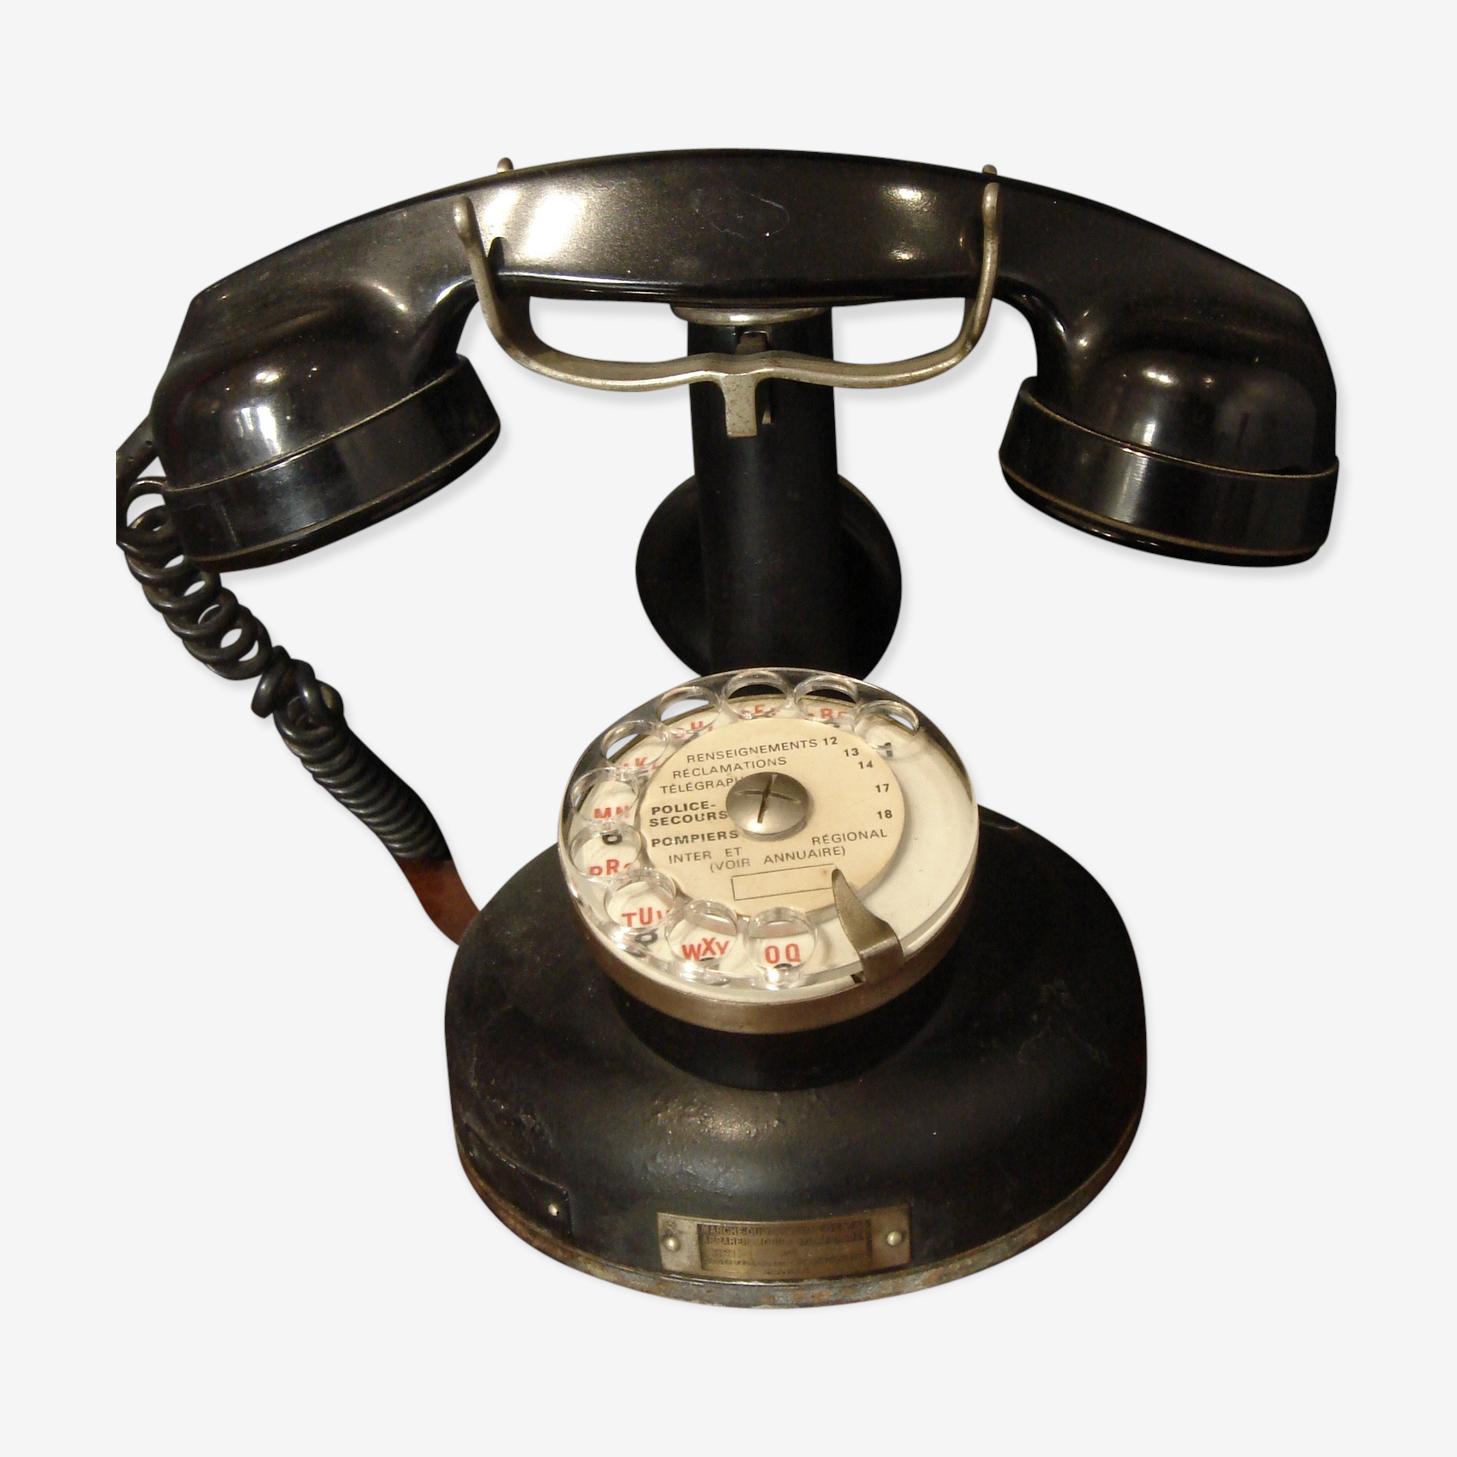 Téléphone de comptoir en bakélite de 1933